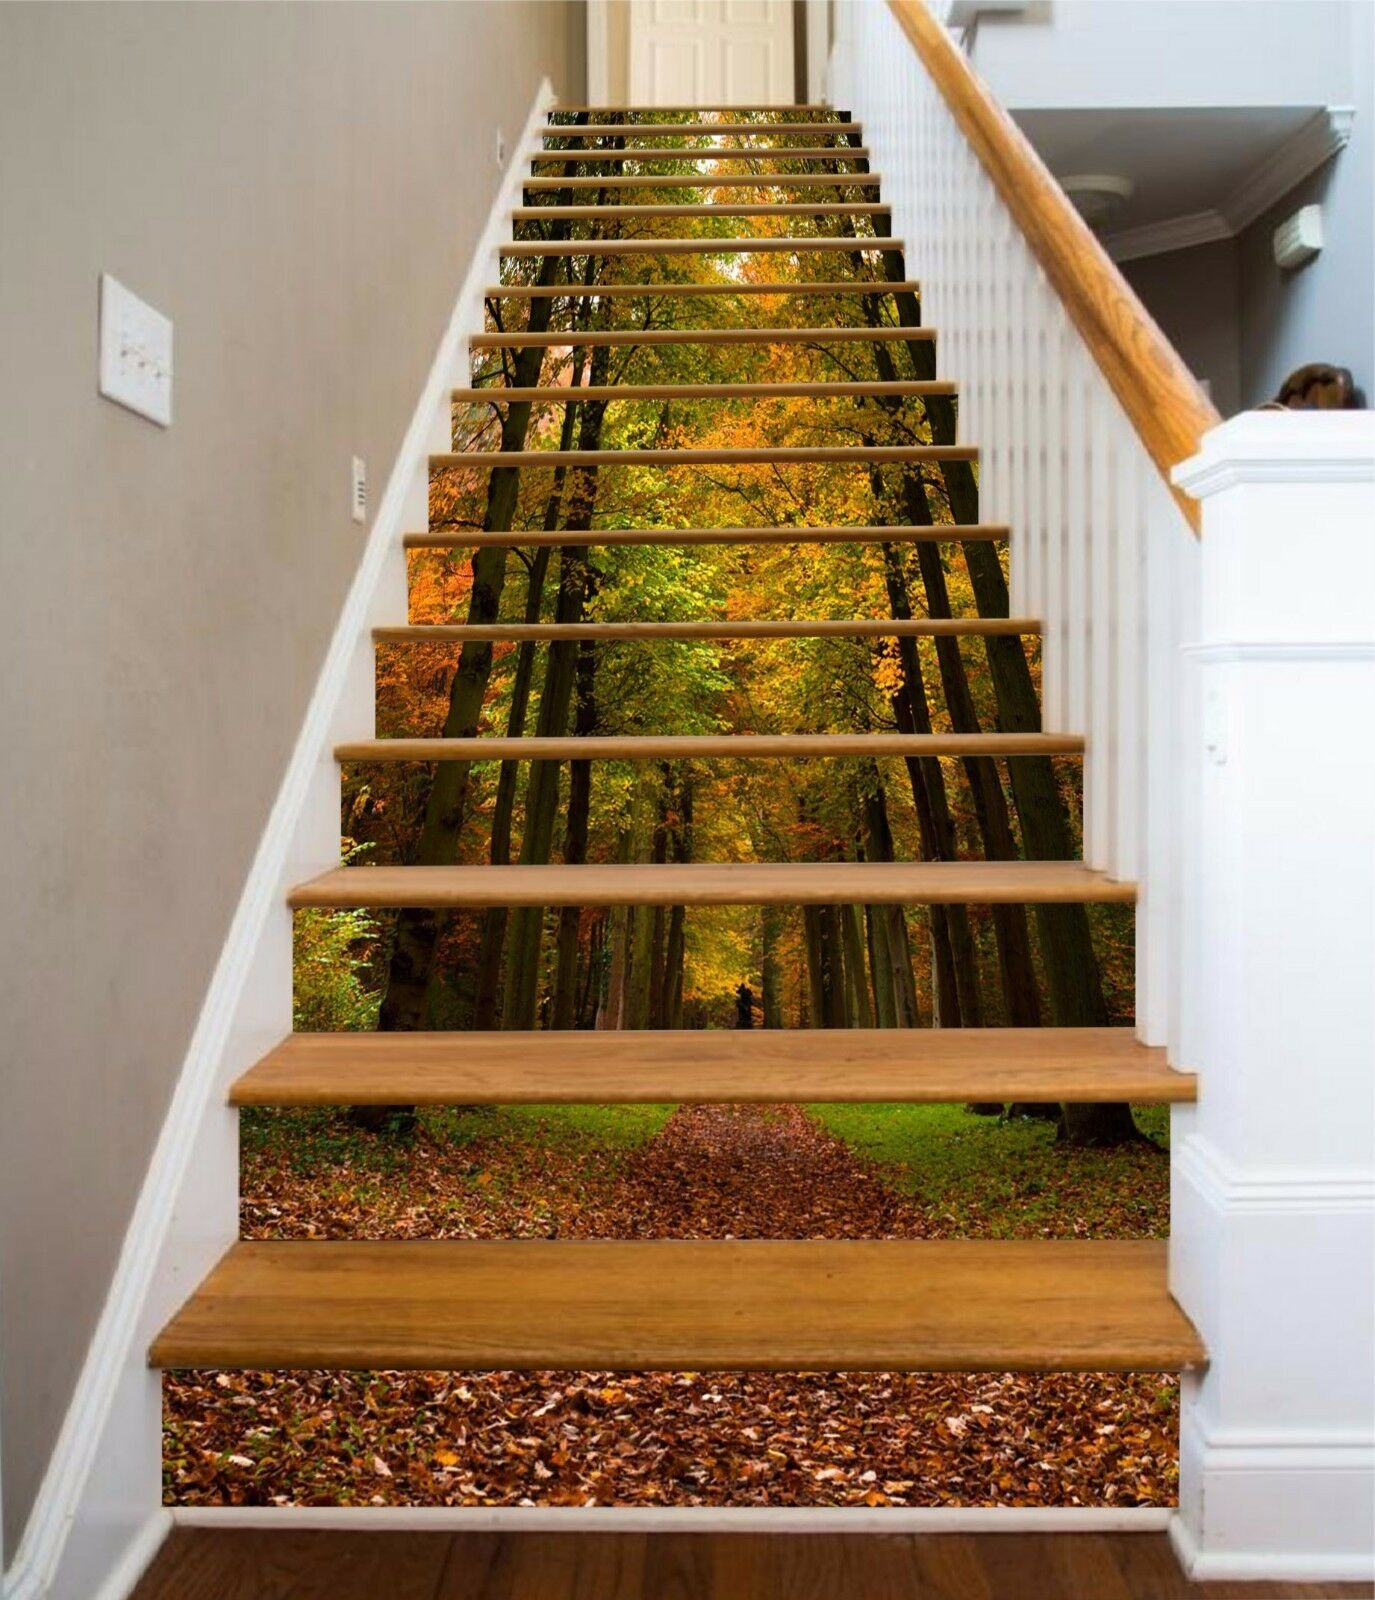 3D Autumn Woods 783 Stair Risers Decoration Photo Mural Vinyl Decal Wallpaper AU